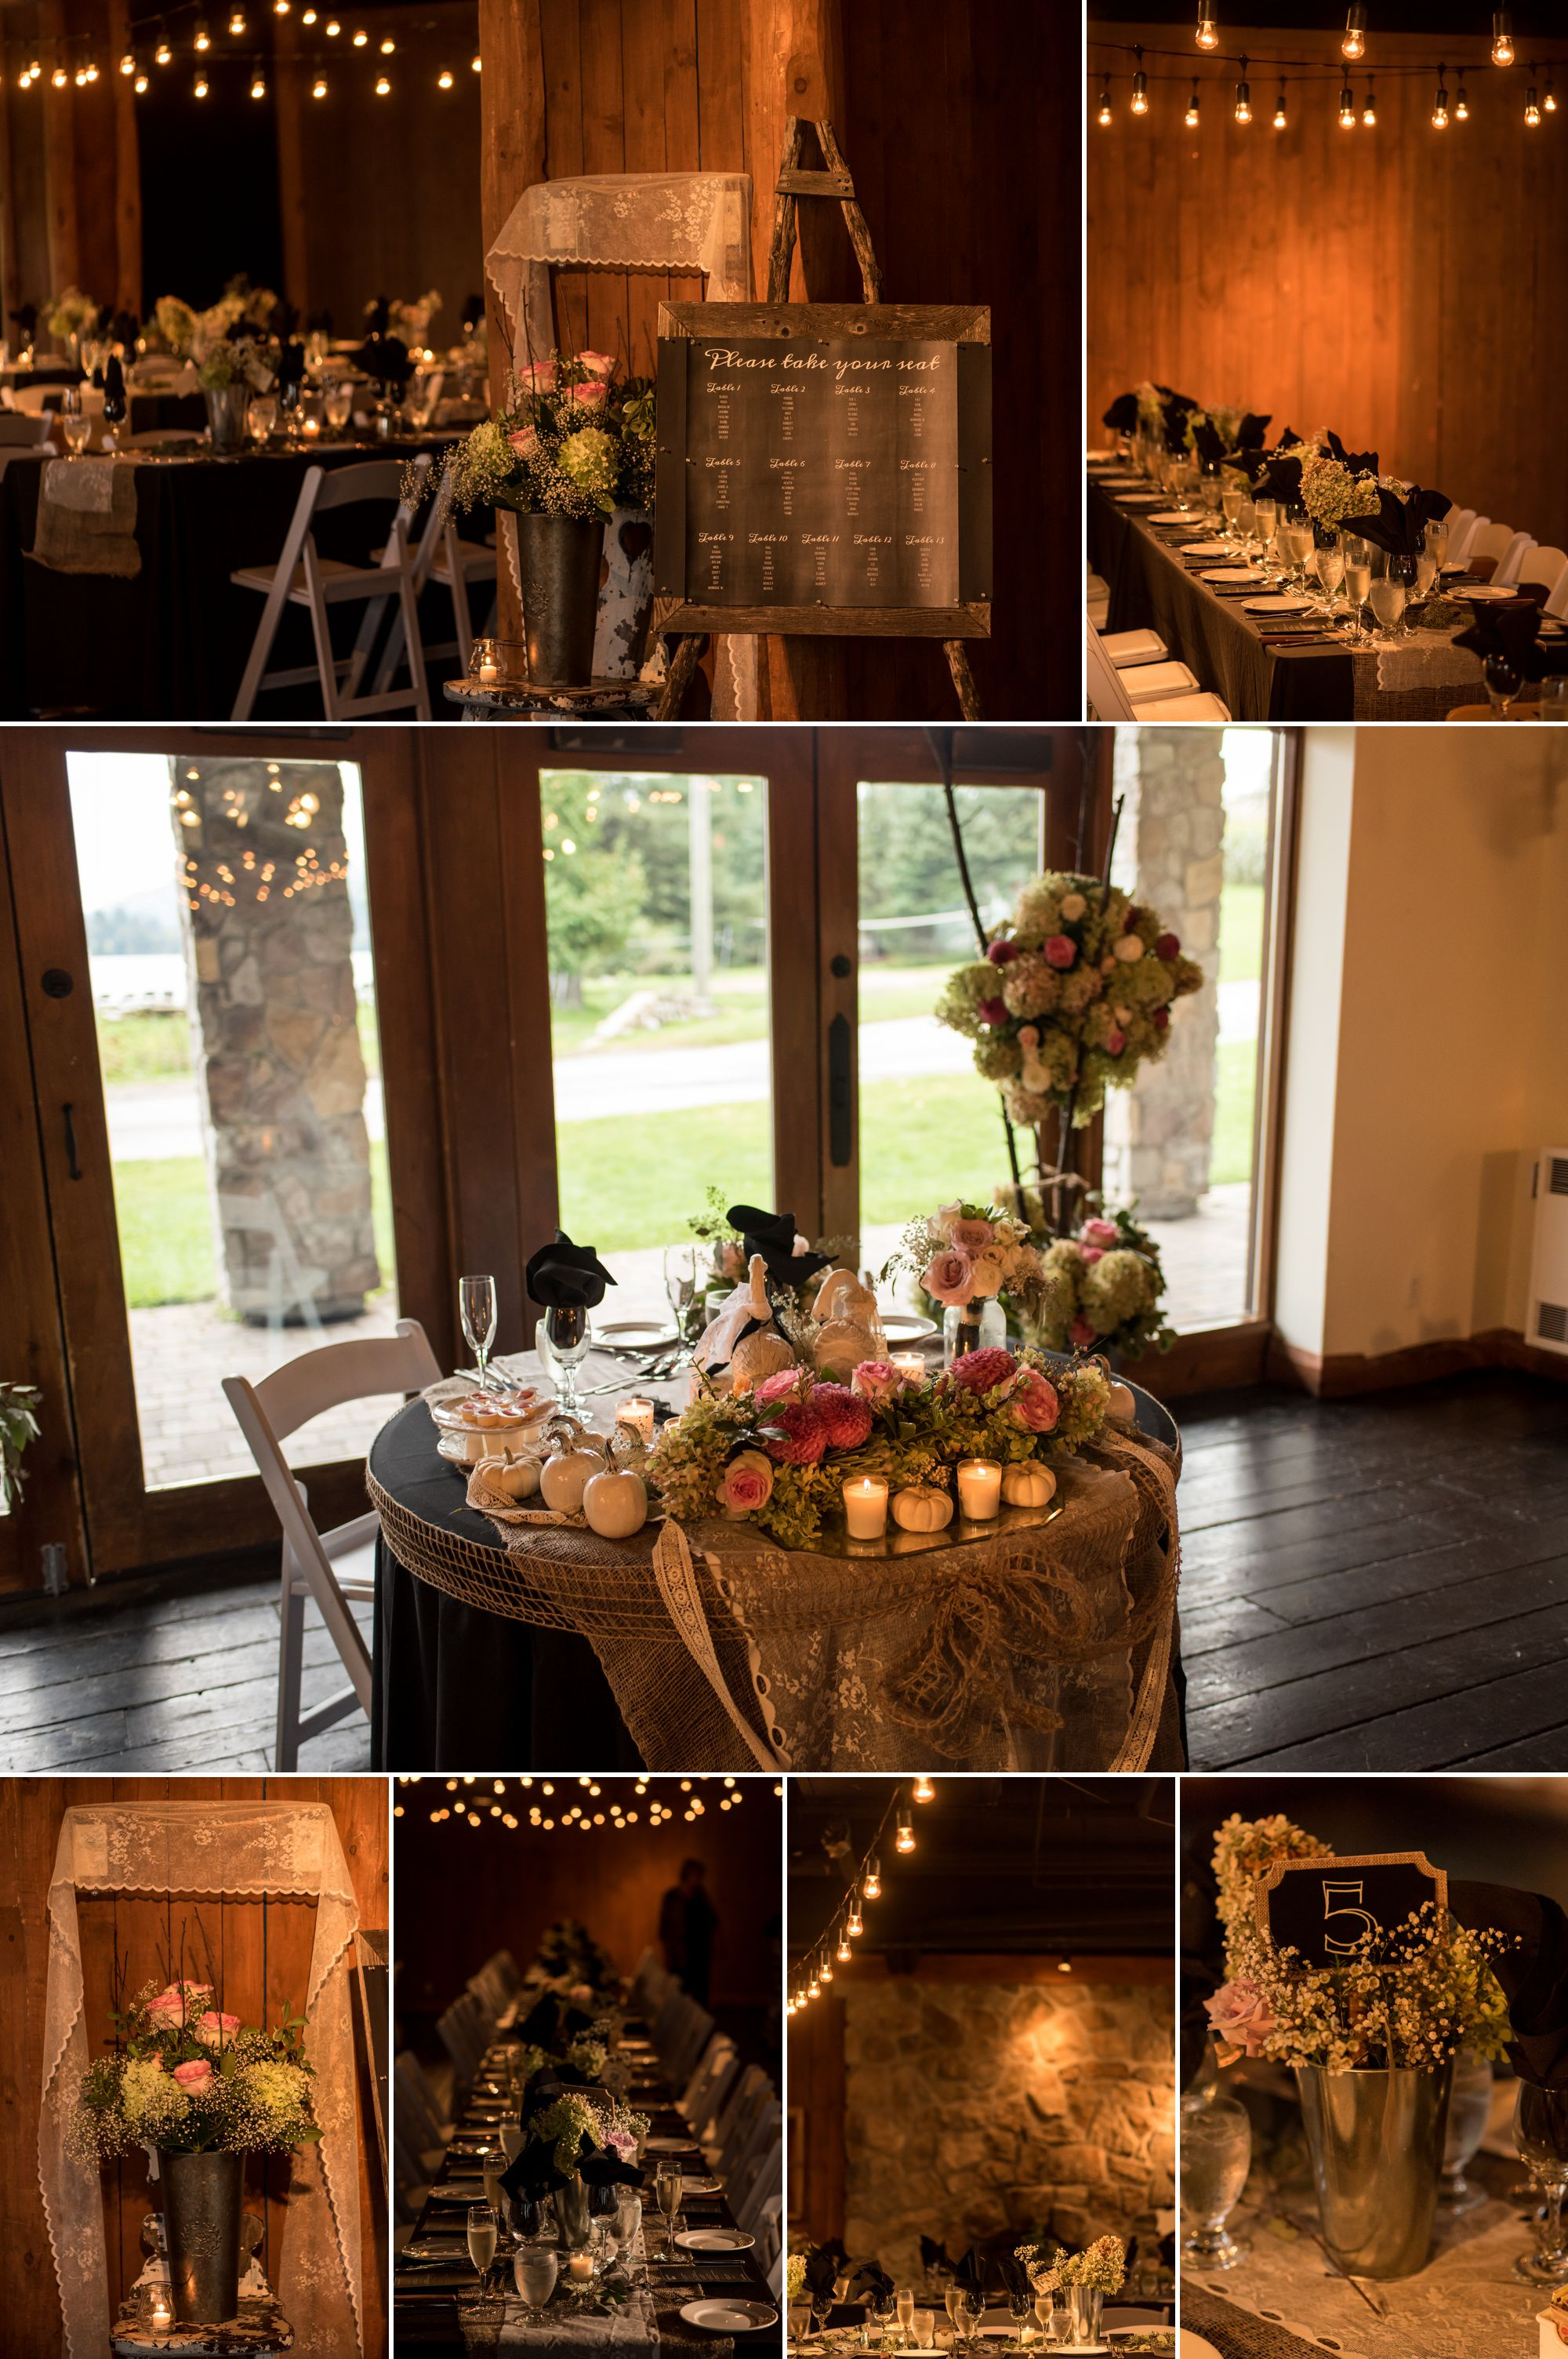 Rustic vintage wedding details